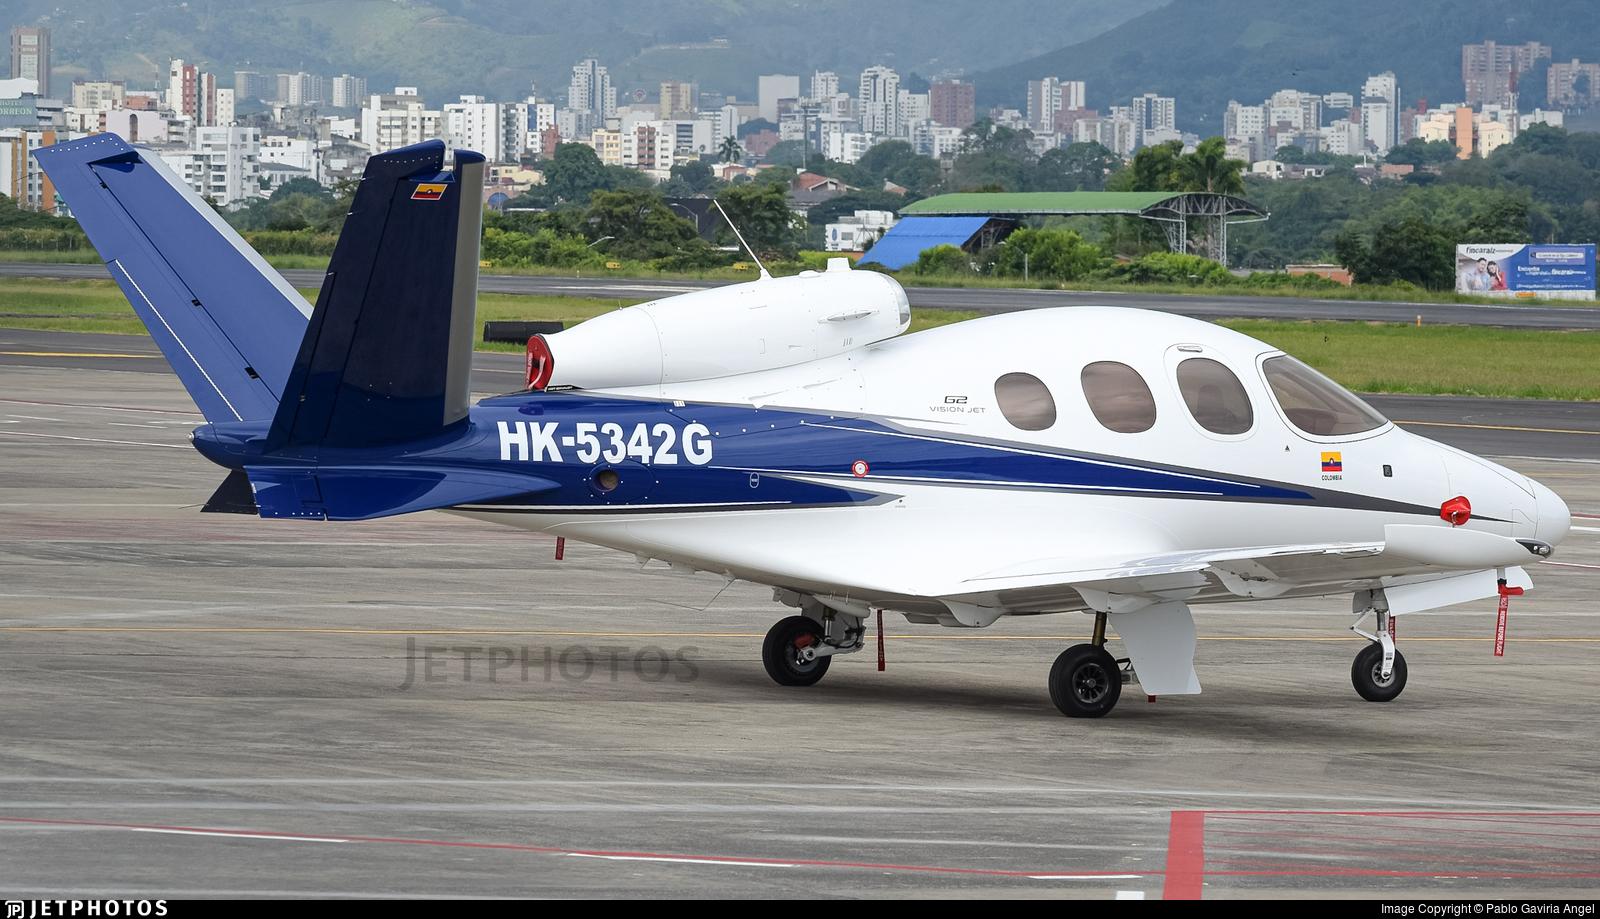 HK-5342G - Cirrus Vision SF50 G2 - Helistar Colombia